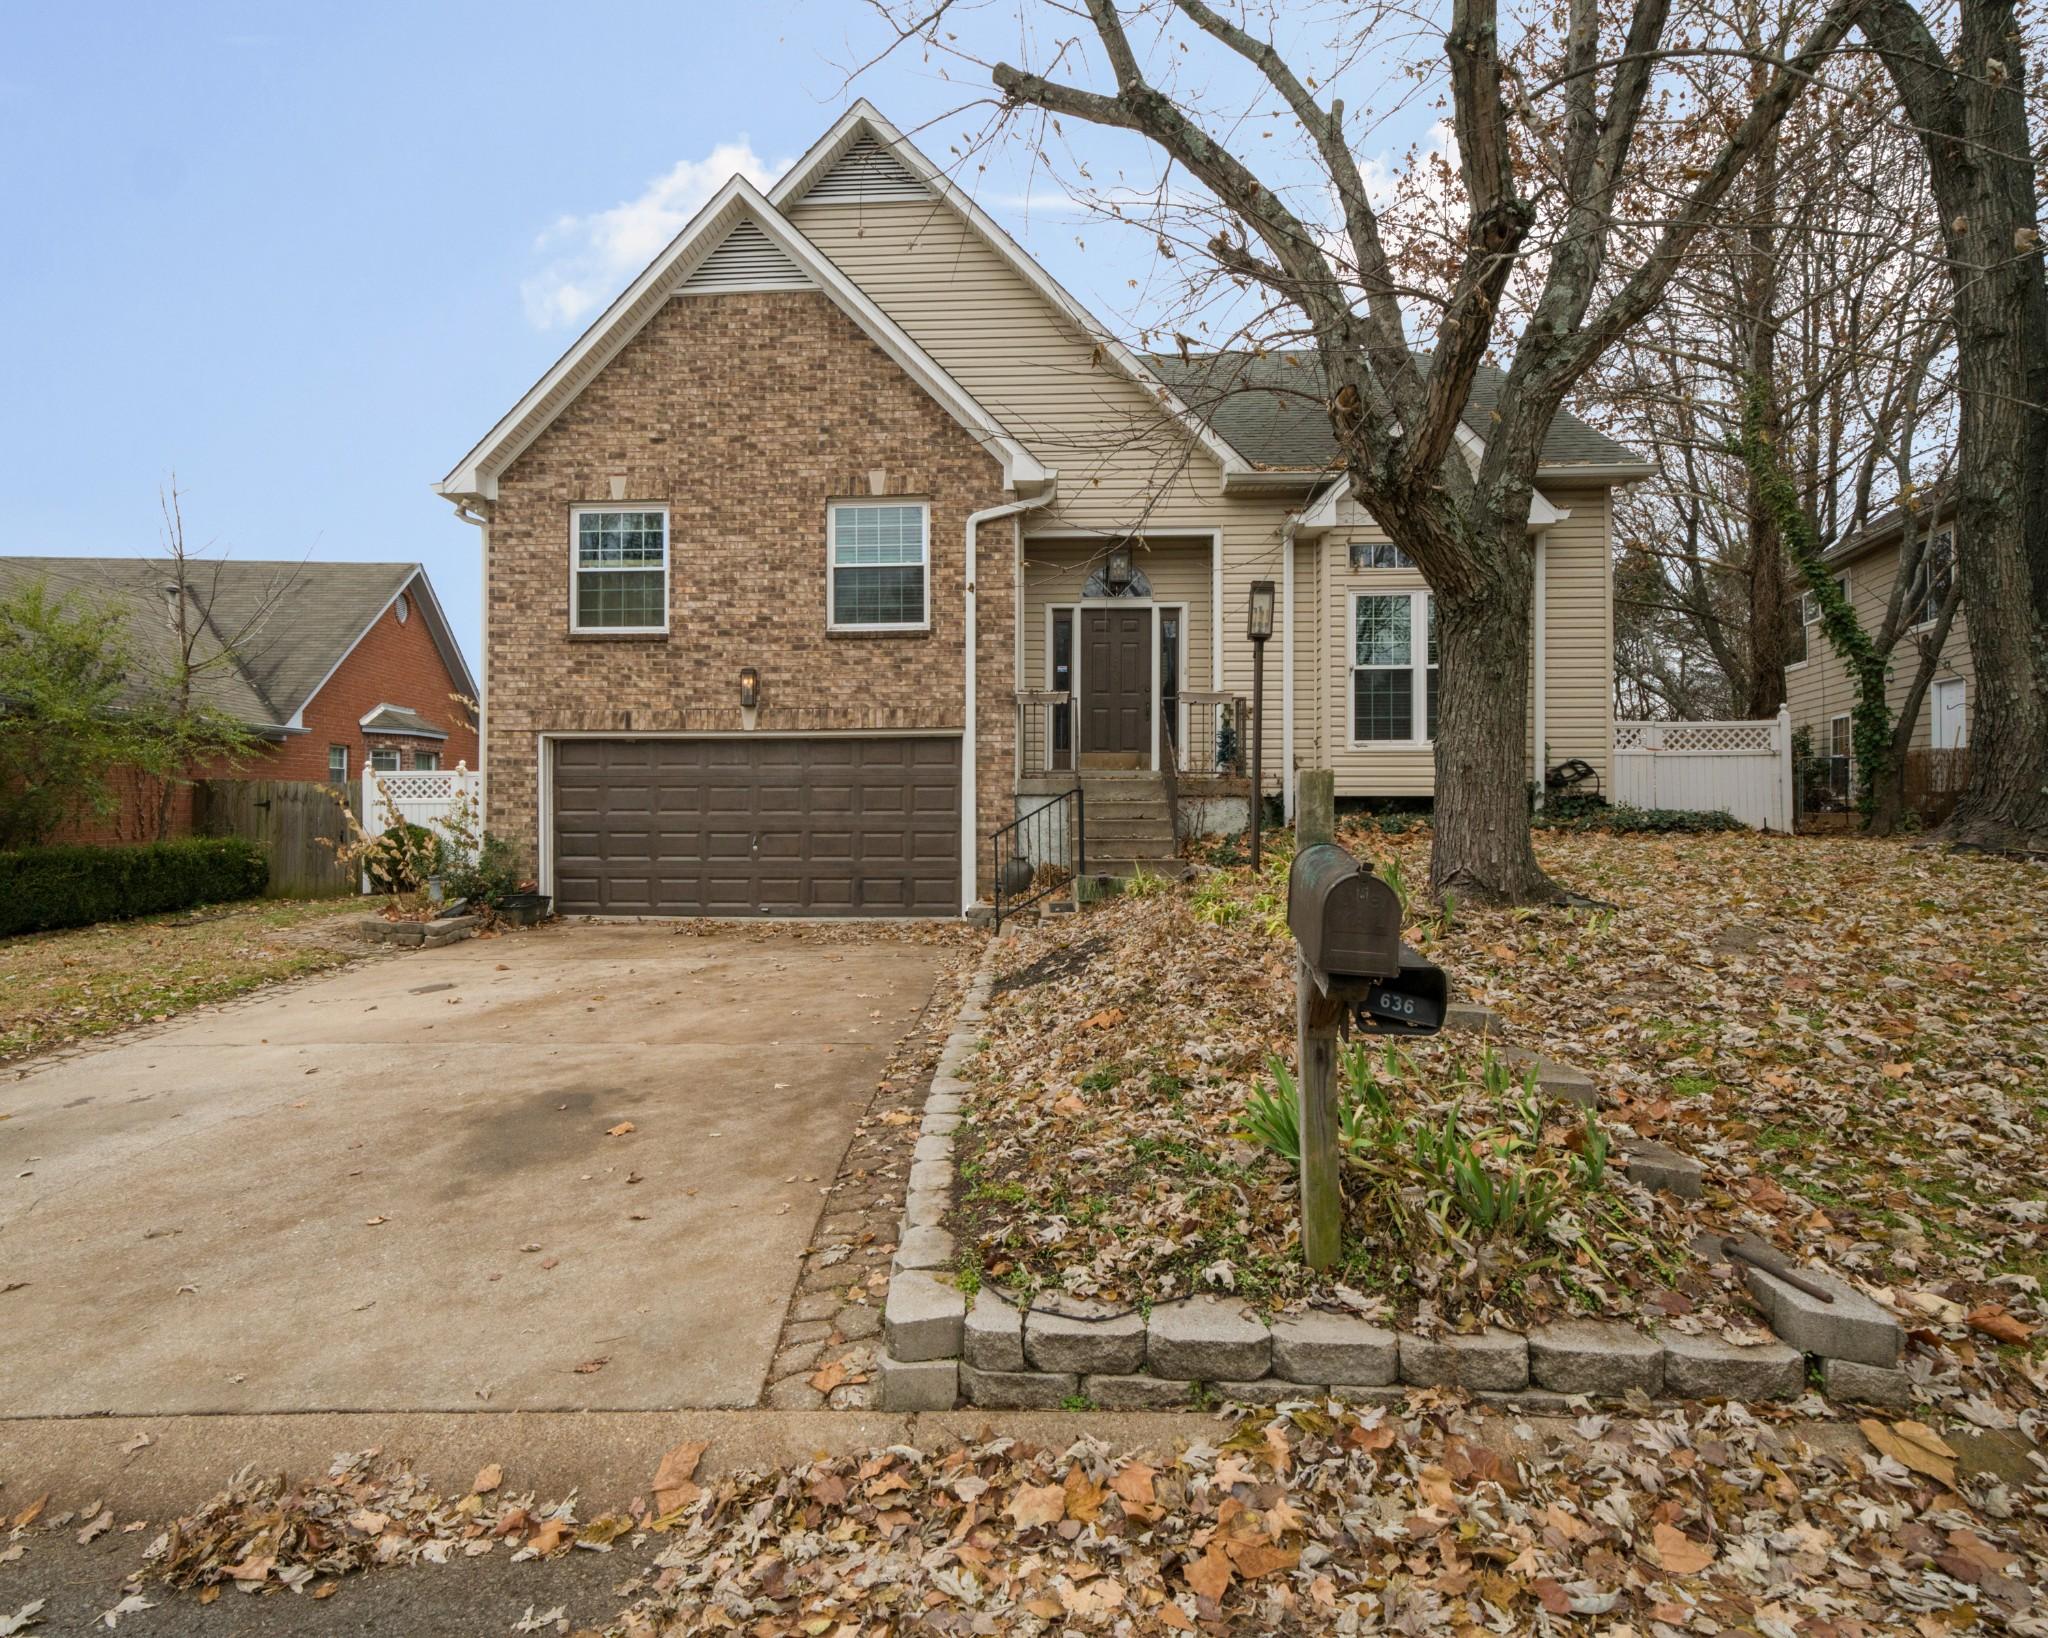 636 Rocky Mountain Pkwy, Antioch, TN 37013 - Antioch, TN real estate listing